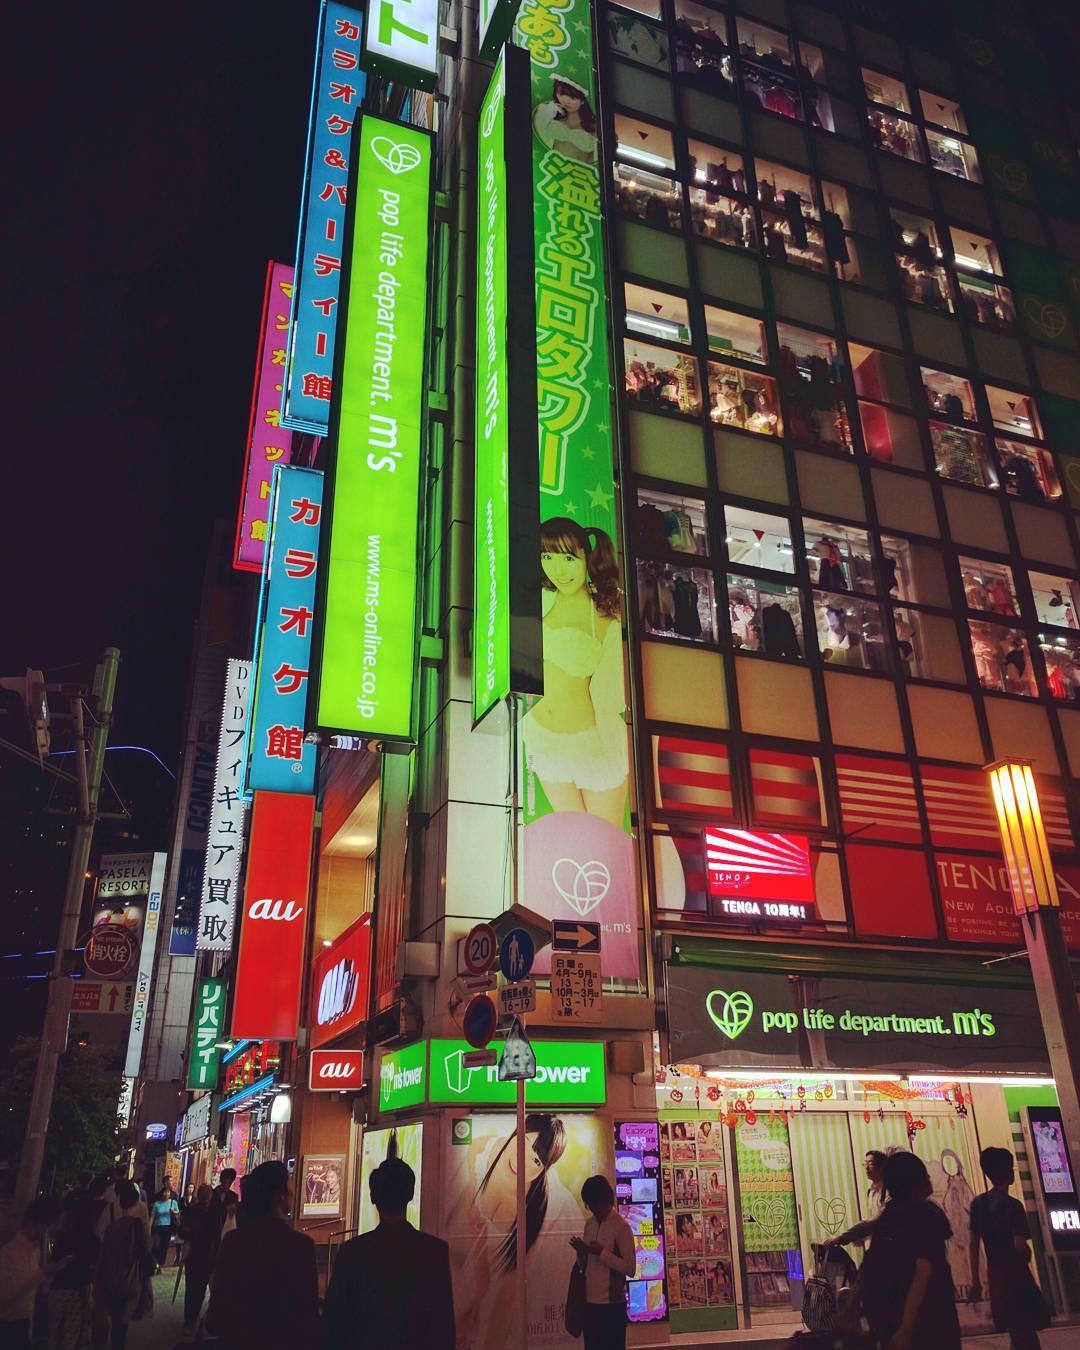 M's Pop Life Department Store, Tokyo, Japan. instagram.com/pah2ho